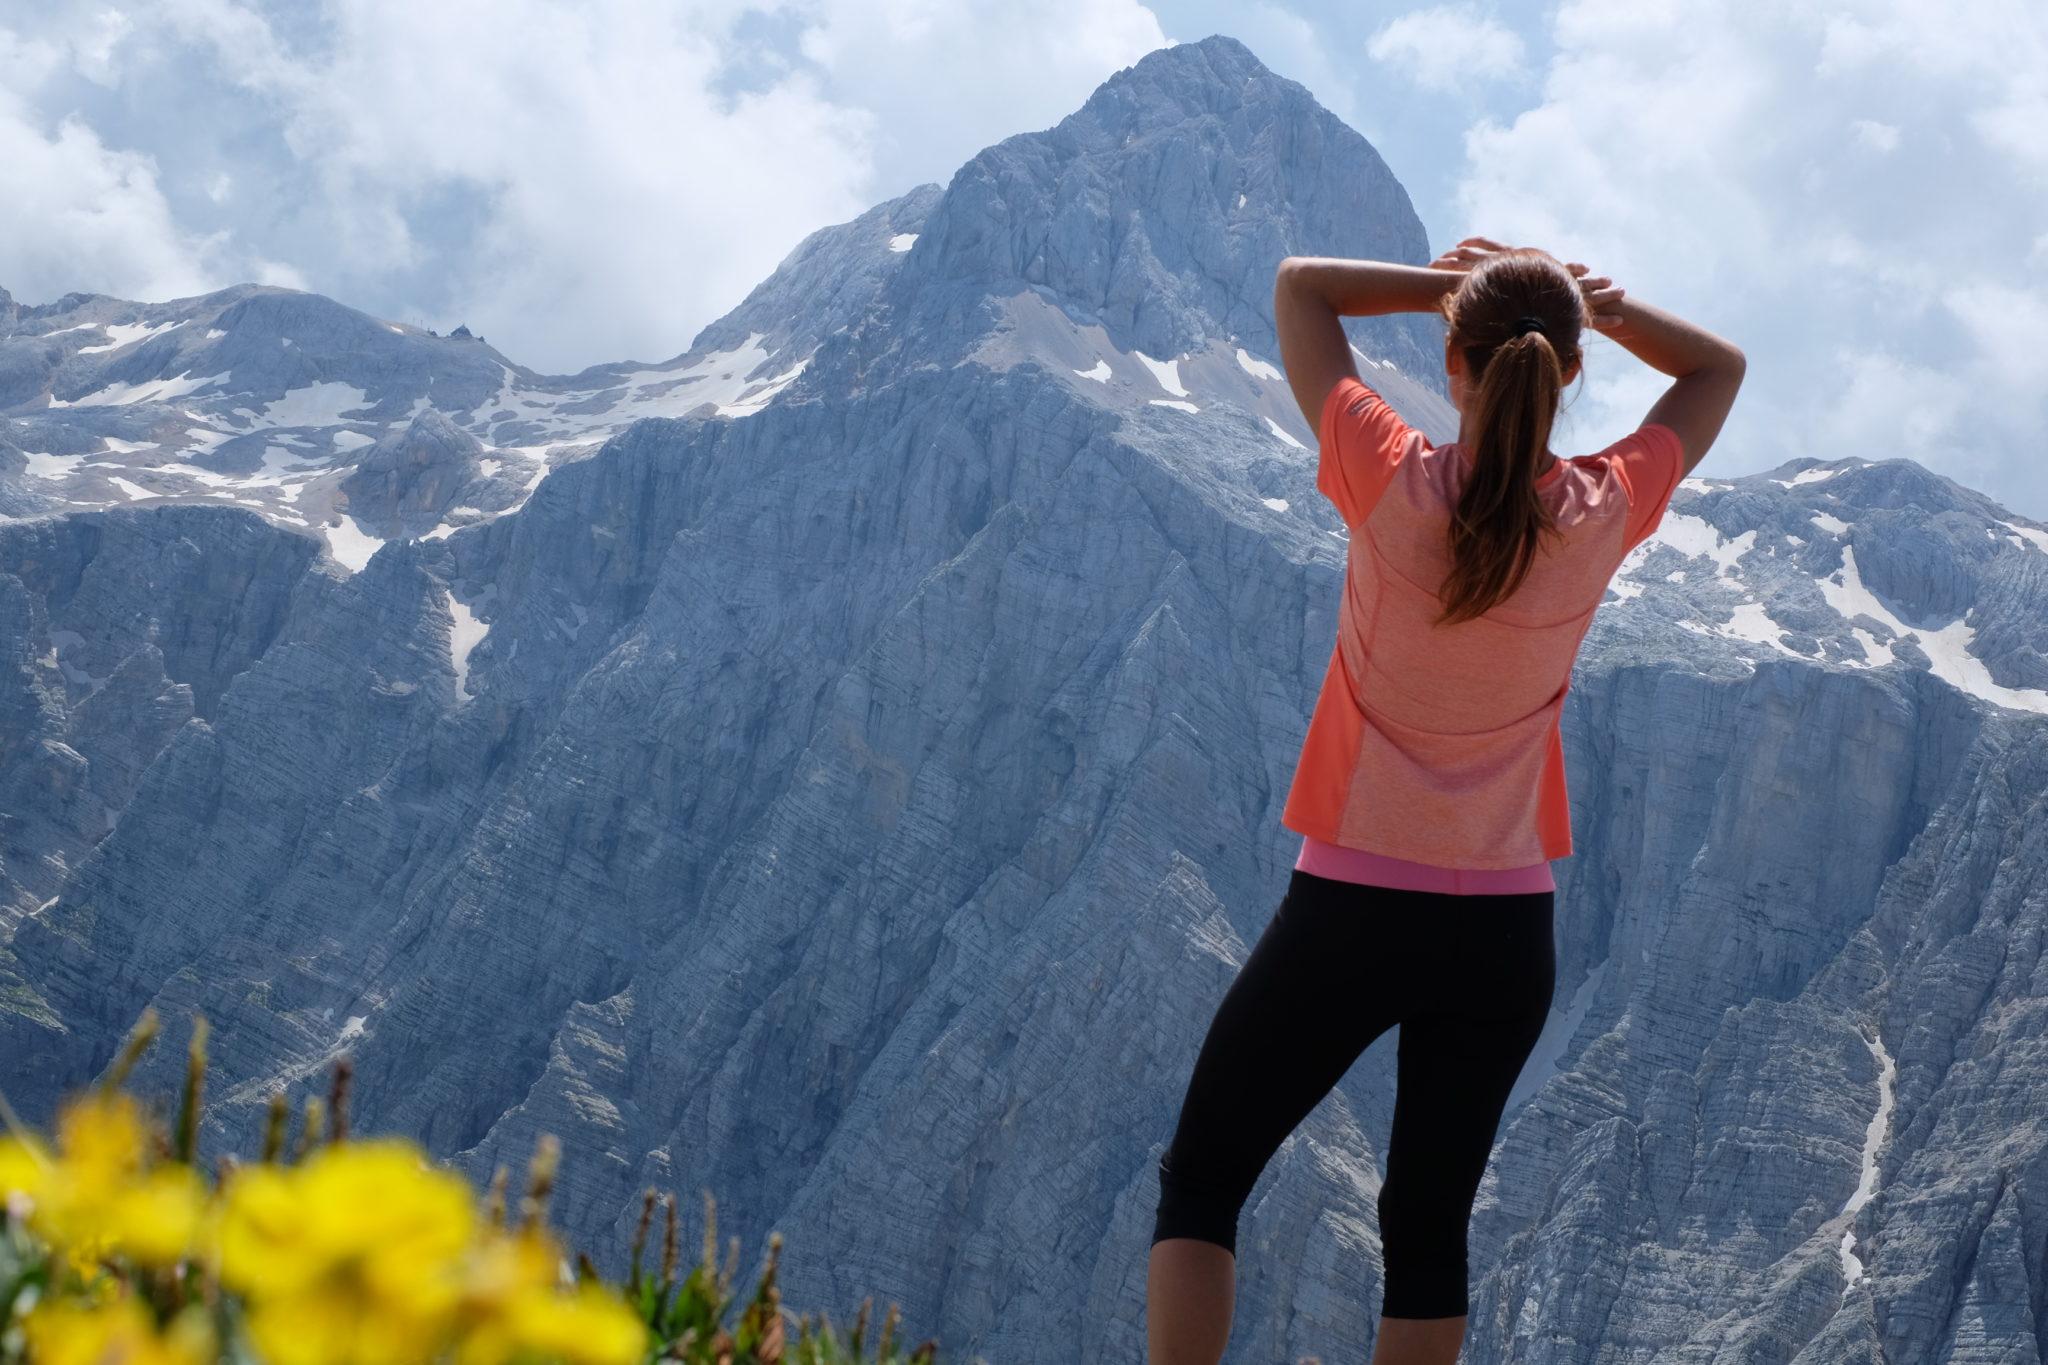 Fantastic views of Triglav, Slovenia's highest mountain